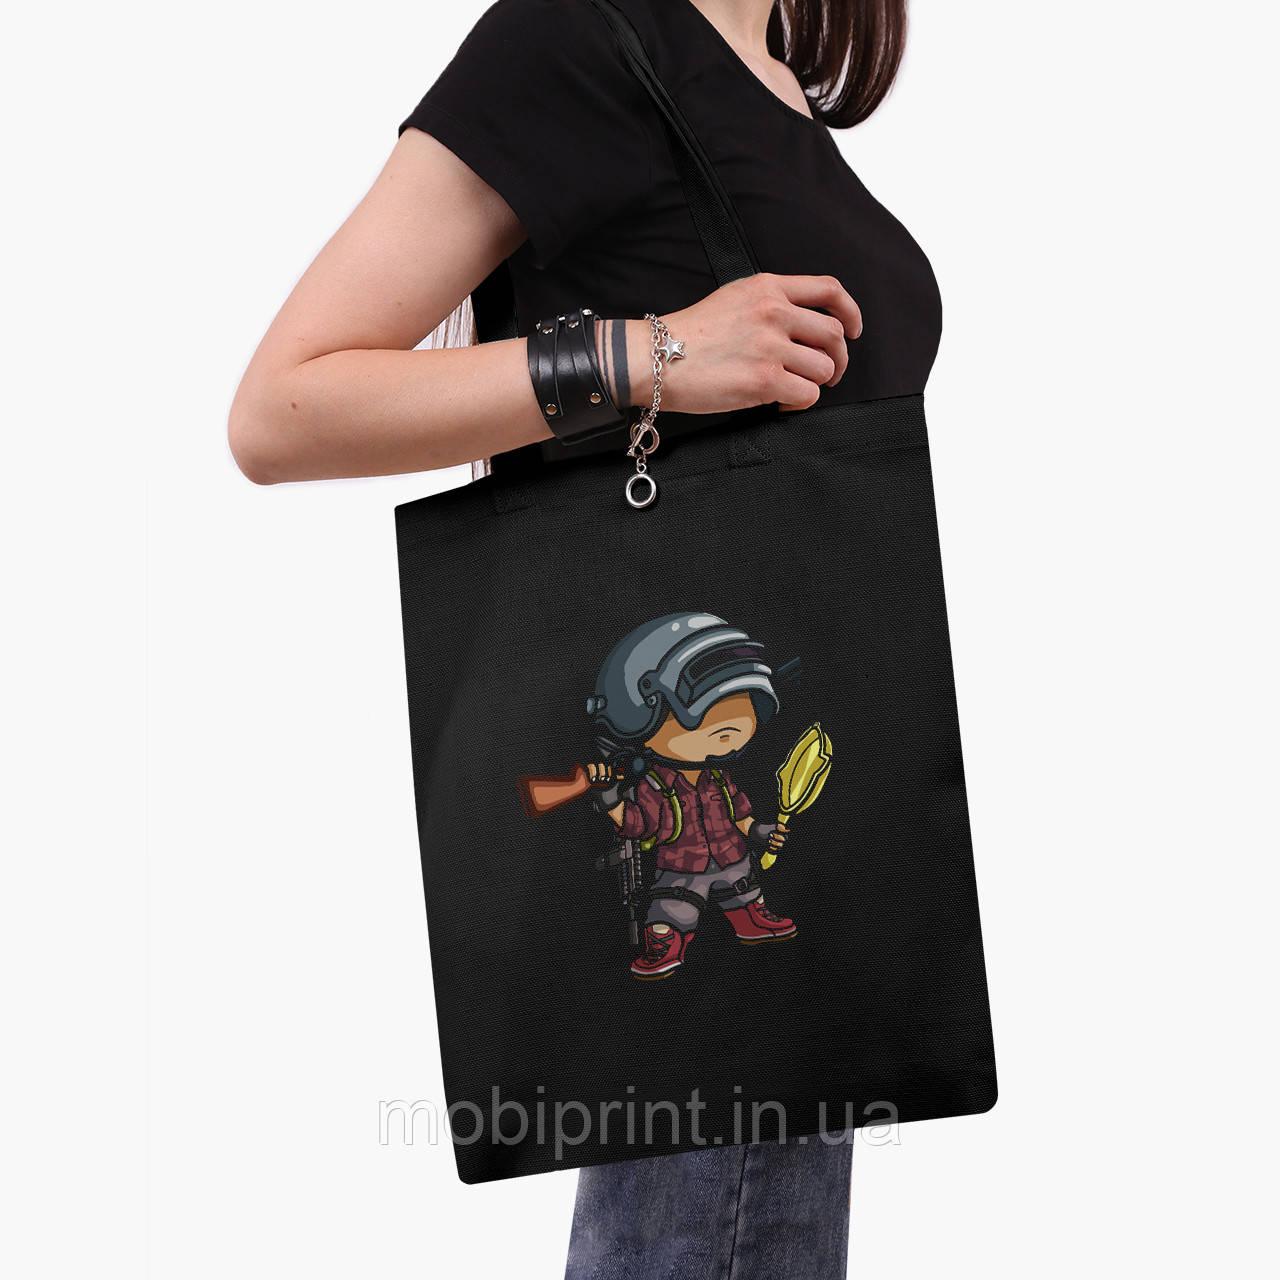 Эко сумка шоппер черная Пубг Пабг (Pubg) (9227-1710-2)  экосумка шопер 41*35 см